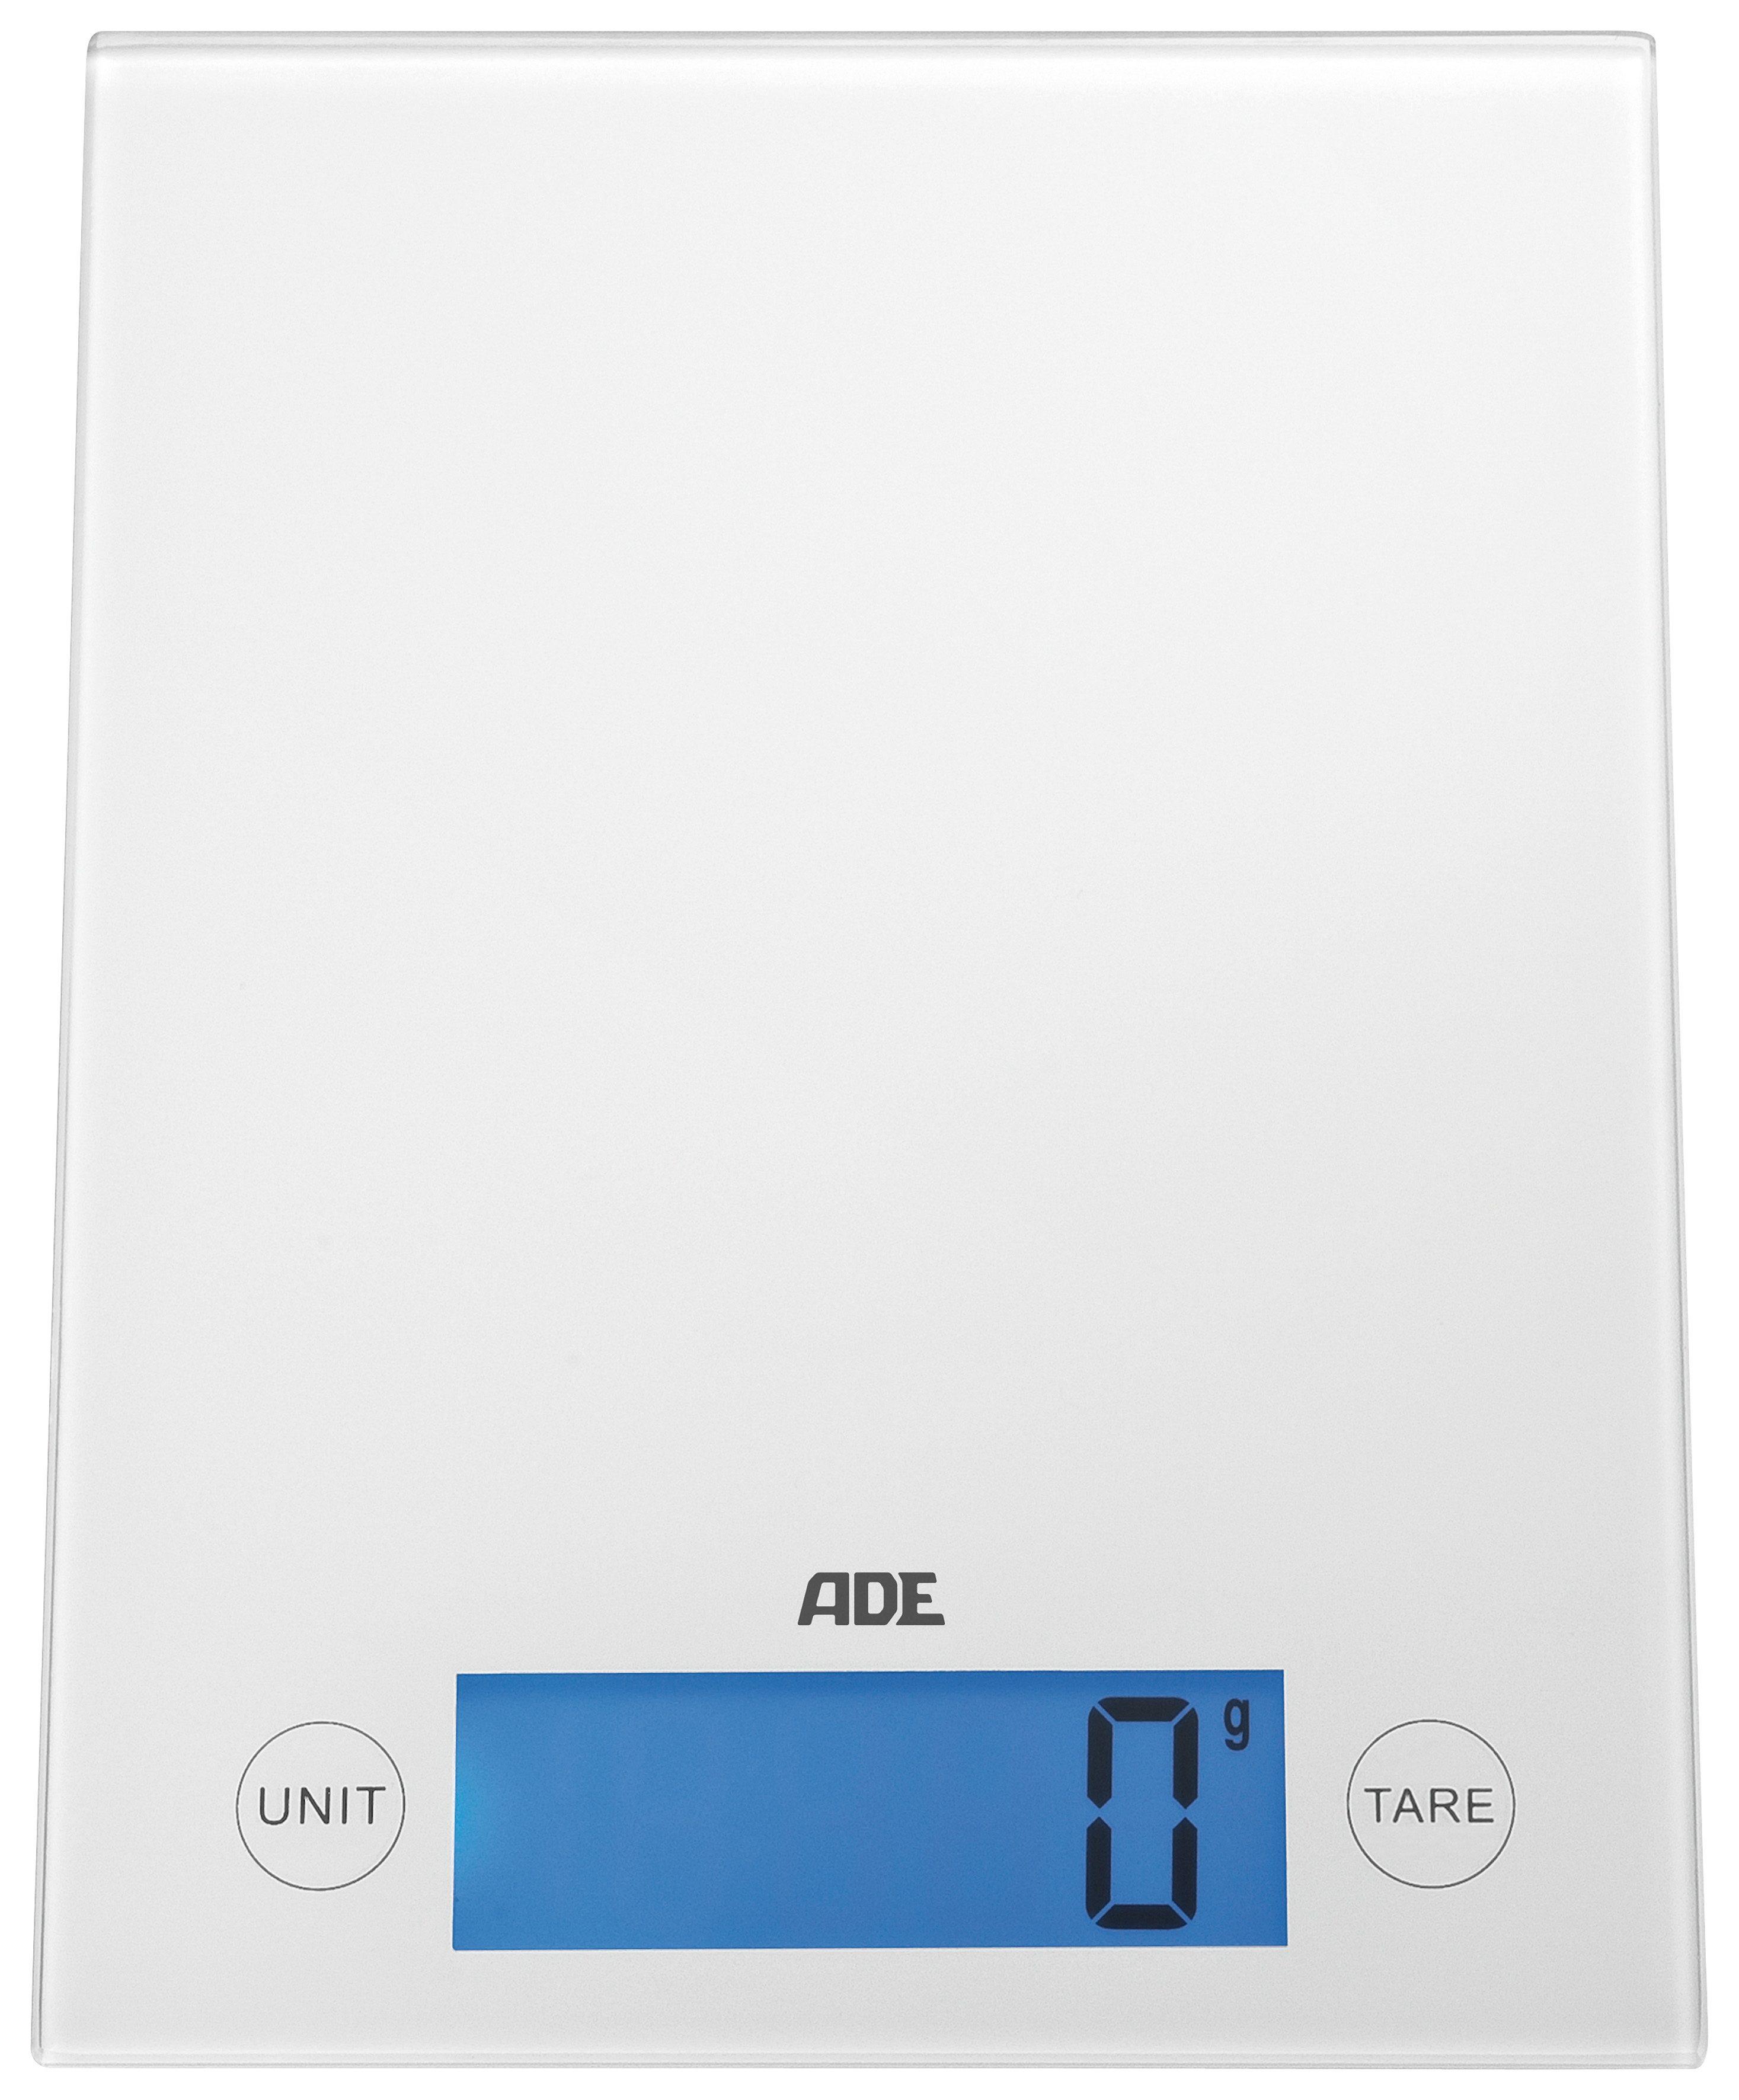 ADE Digitale Küchenwaage KE 1128/1129 Ramona